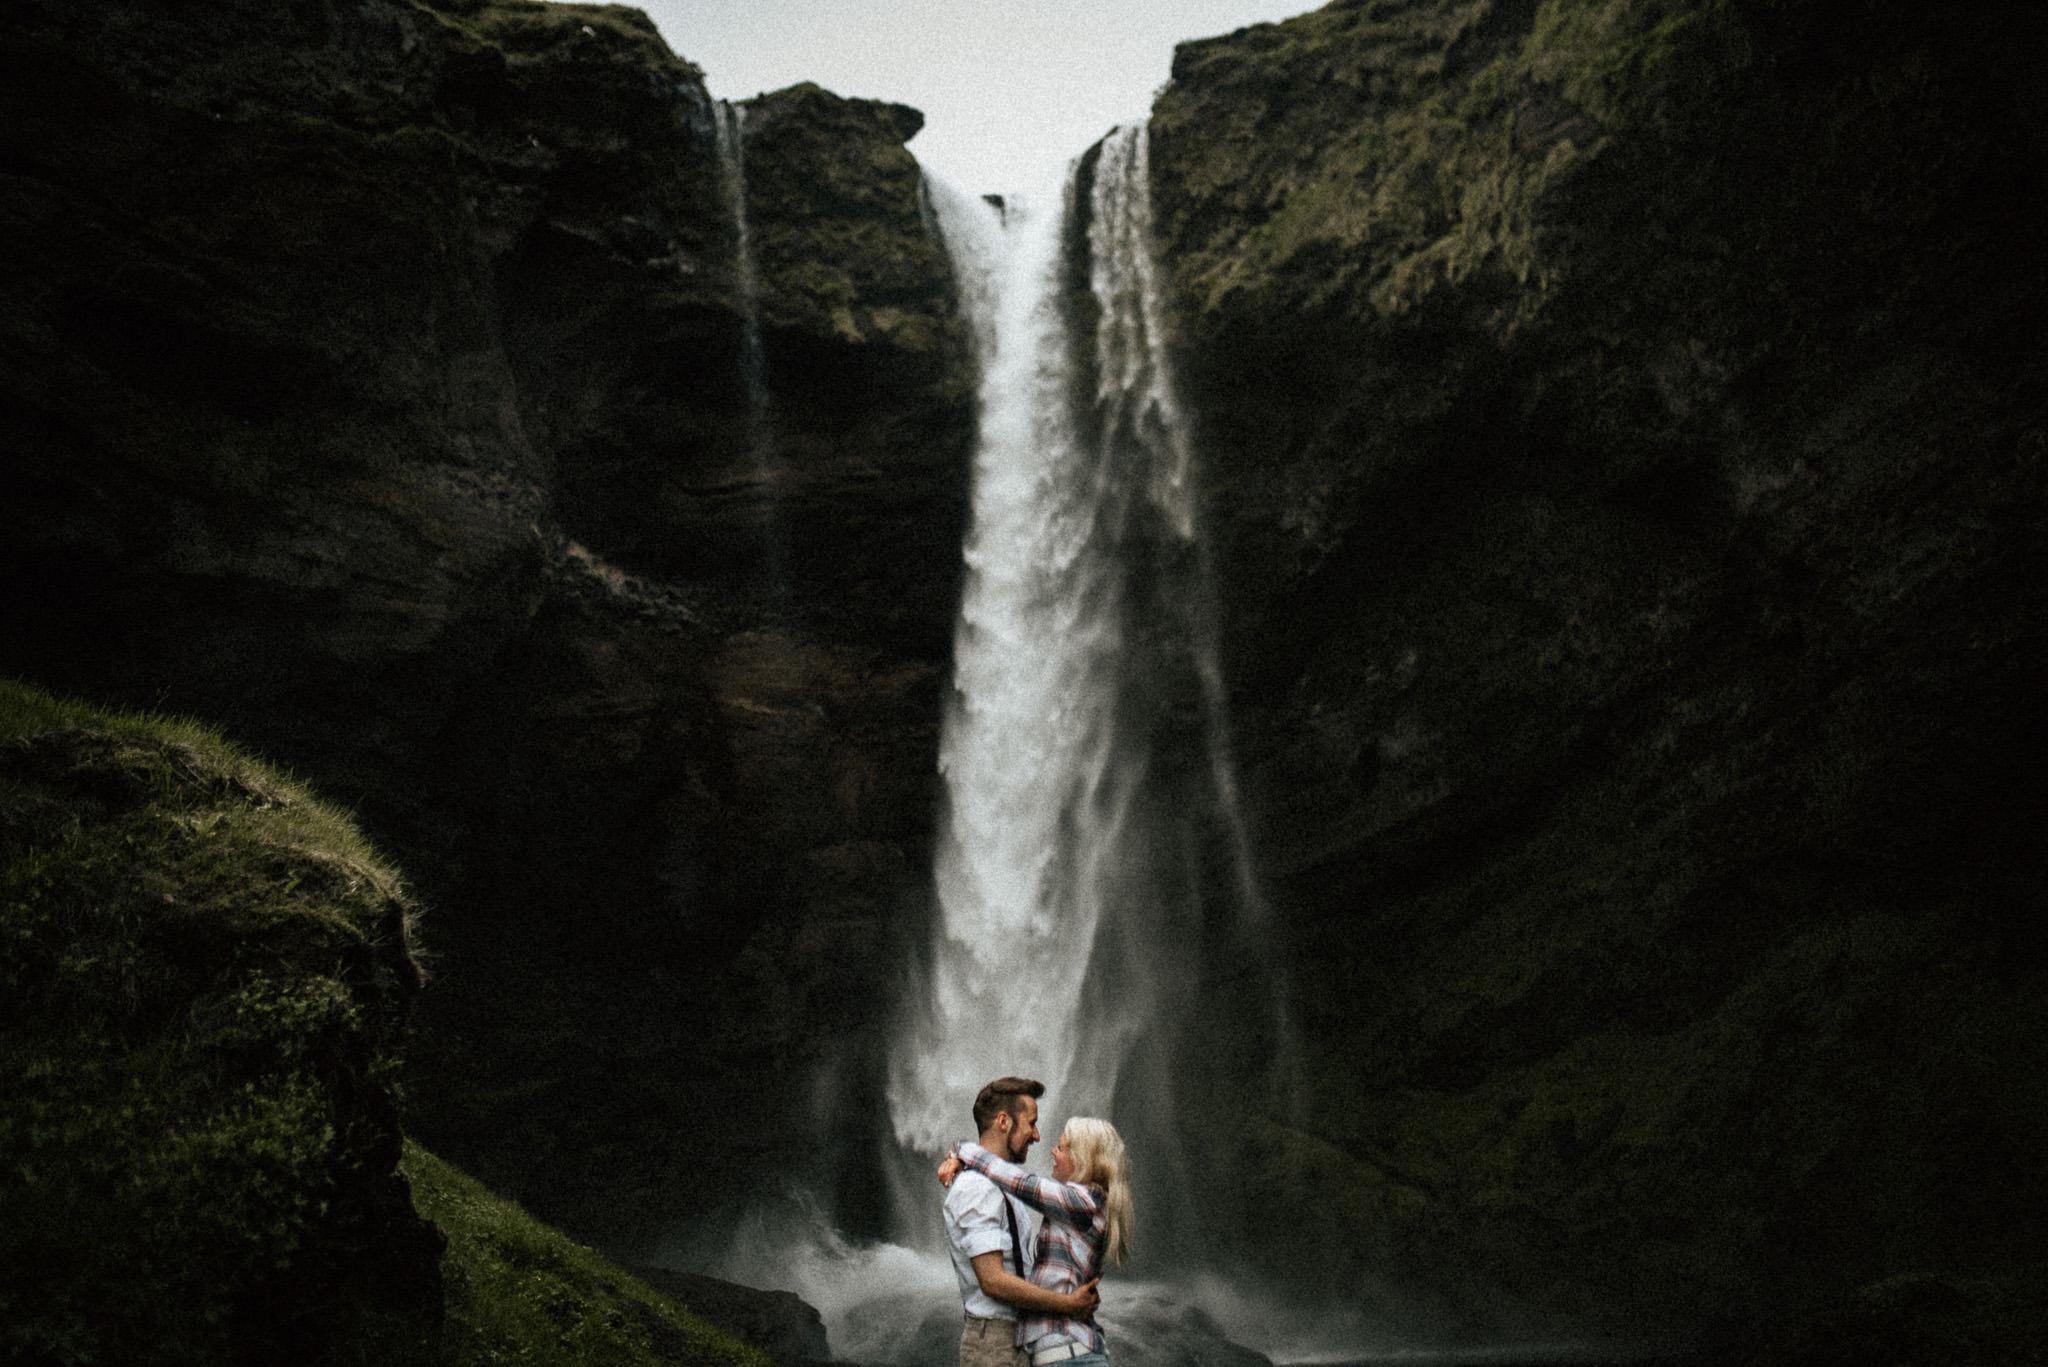 Wedding proposal Iceland - Timo Hess Fotografie - Hochzeitsantrag Island - Hochzeitsfotograf Würzburg - Destinationwedding